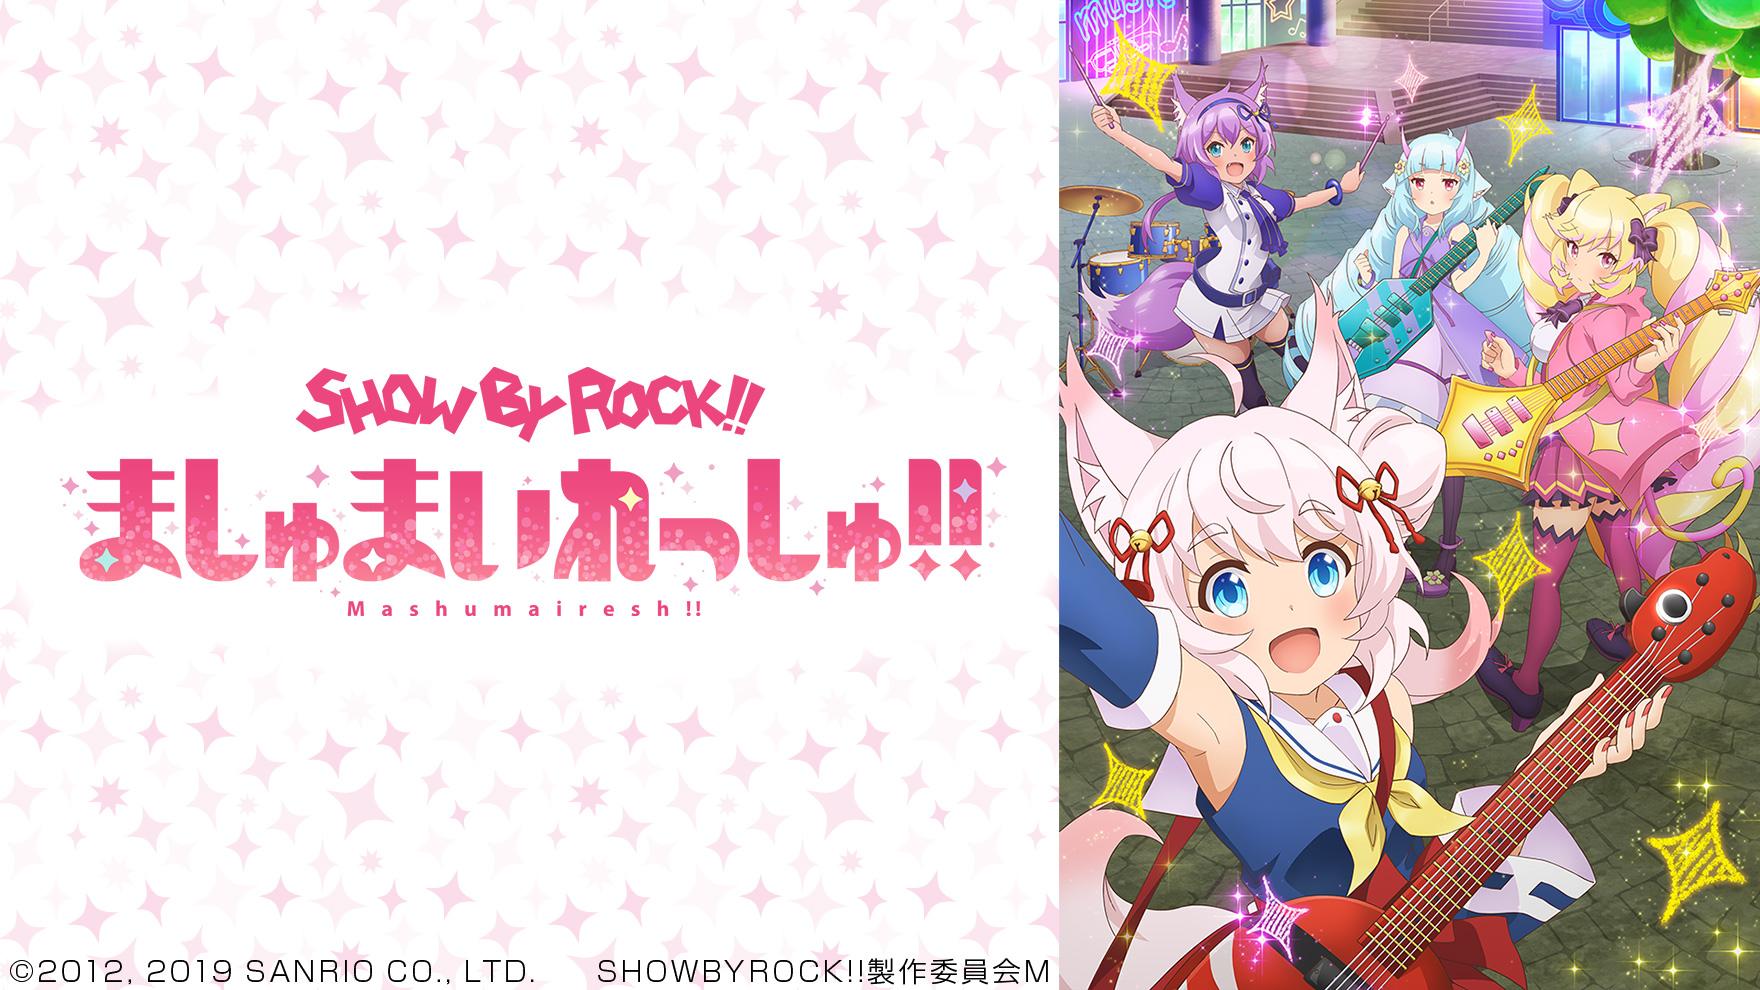 SHOW BY ROCK!! ましゅまいれっしゅ!!のサムネイル